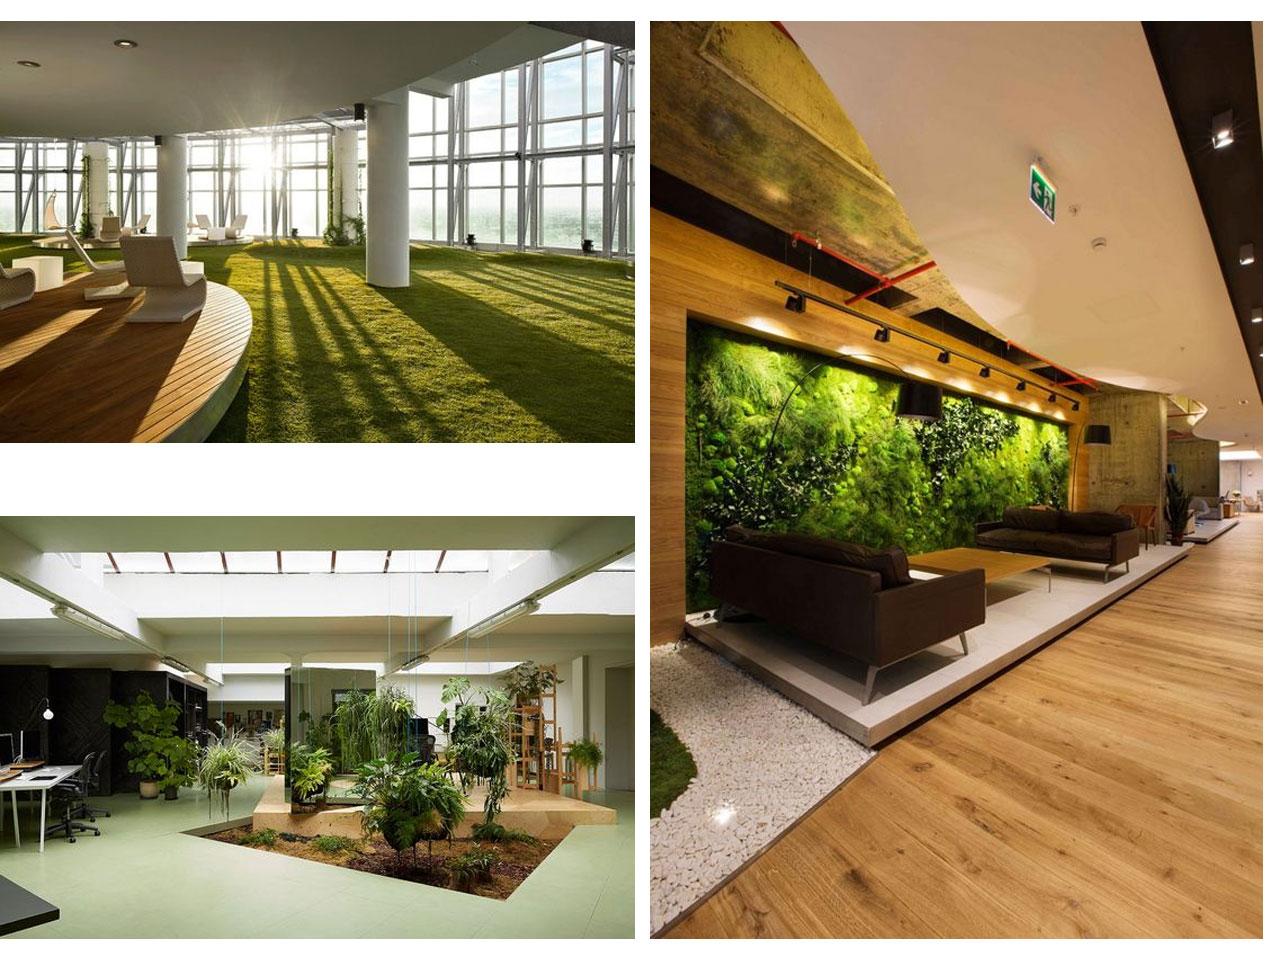 Tendencias oficinas 2016 2017 dise o de interiores for Jardines de pared para interiores